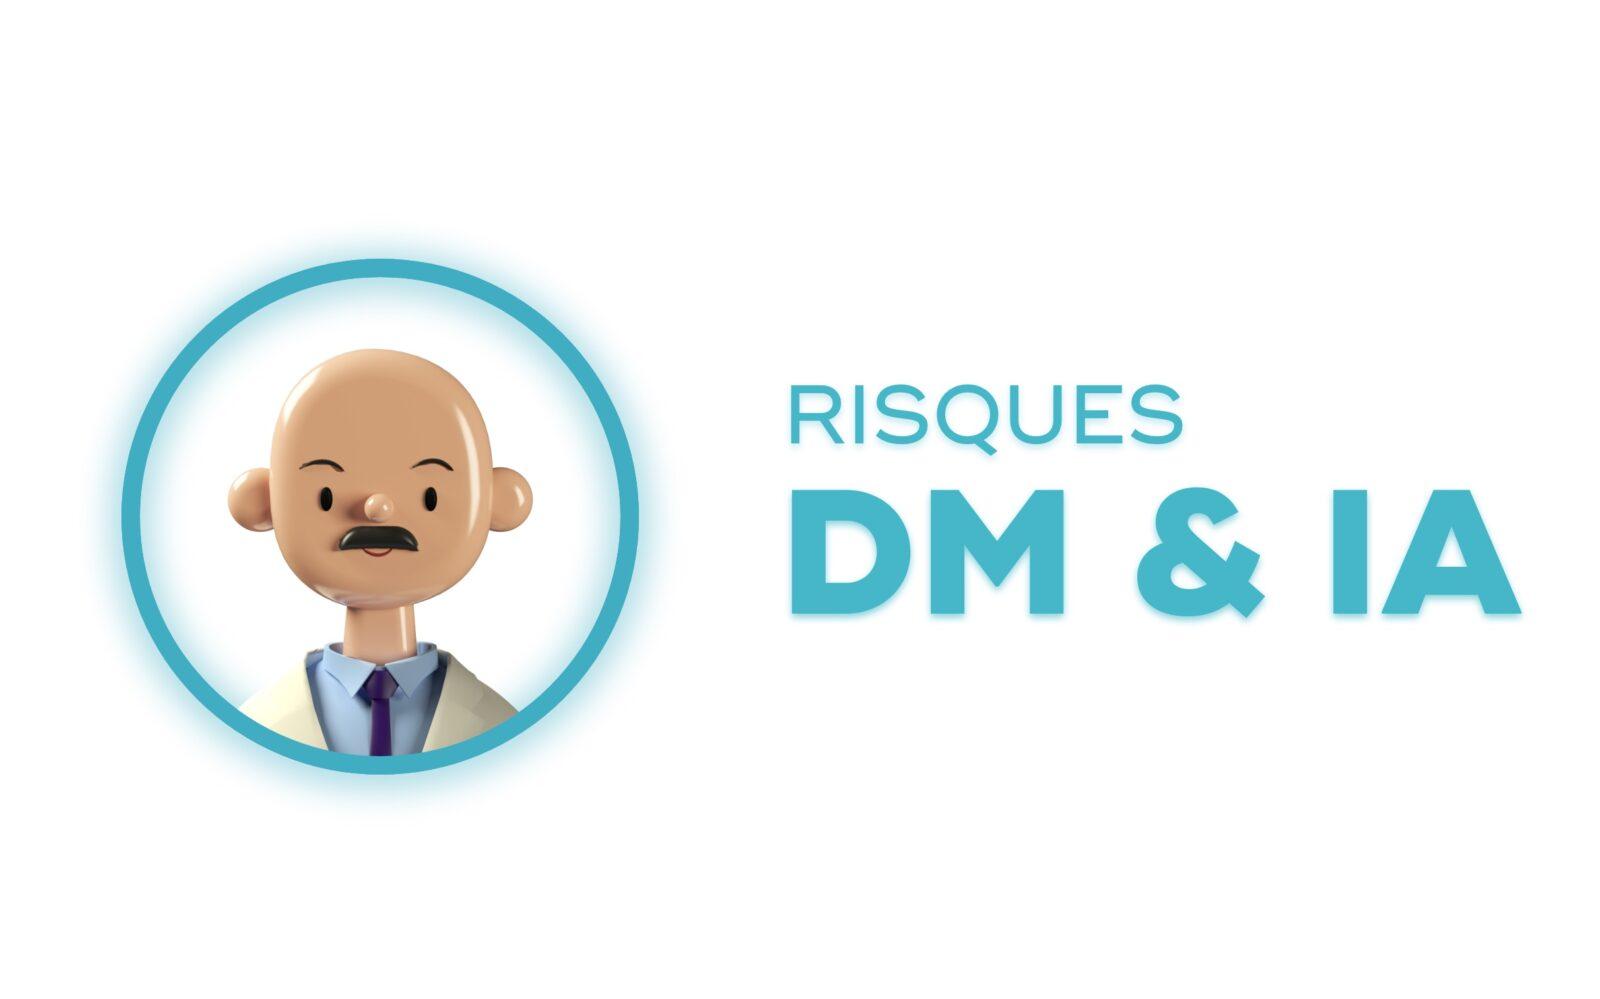 RISQUES DM & IA